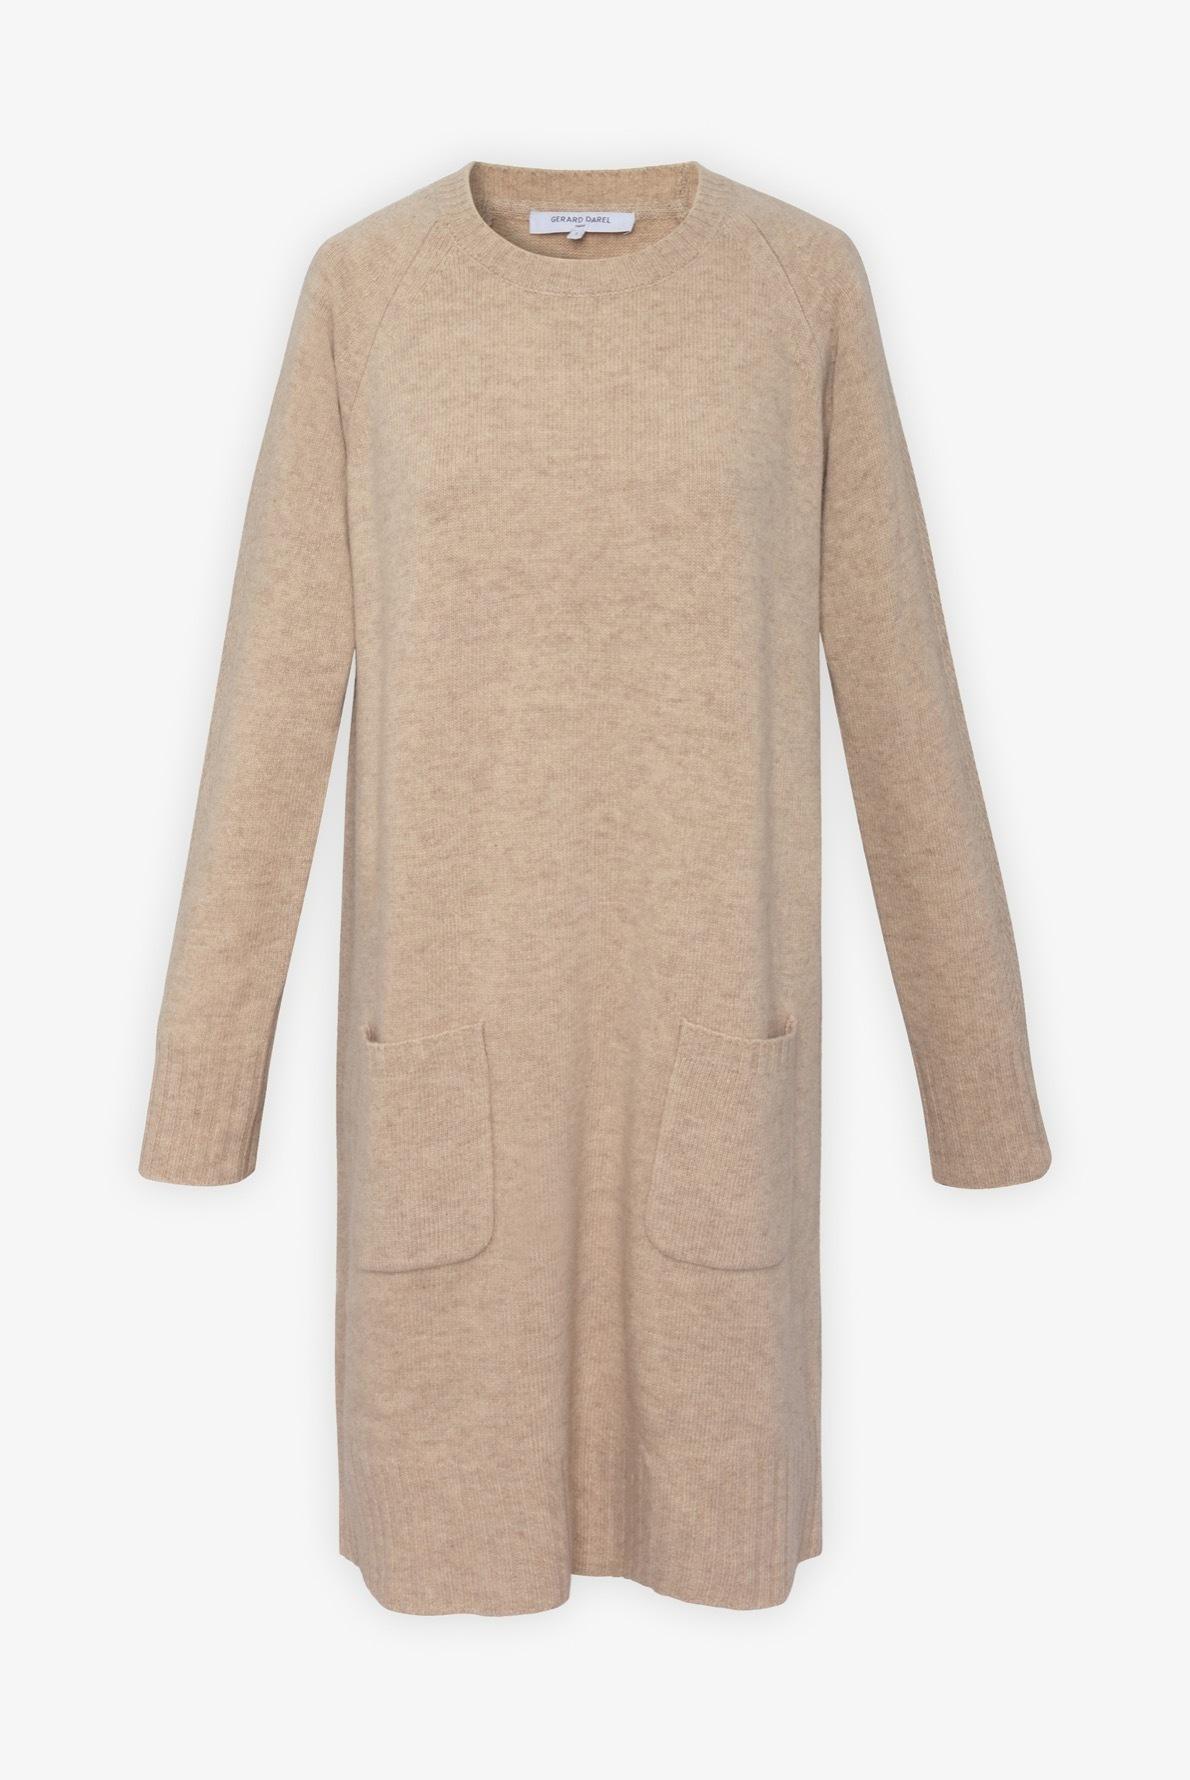 Tuline - Платье-свитер из шерсти и кашемира